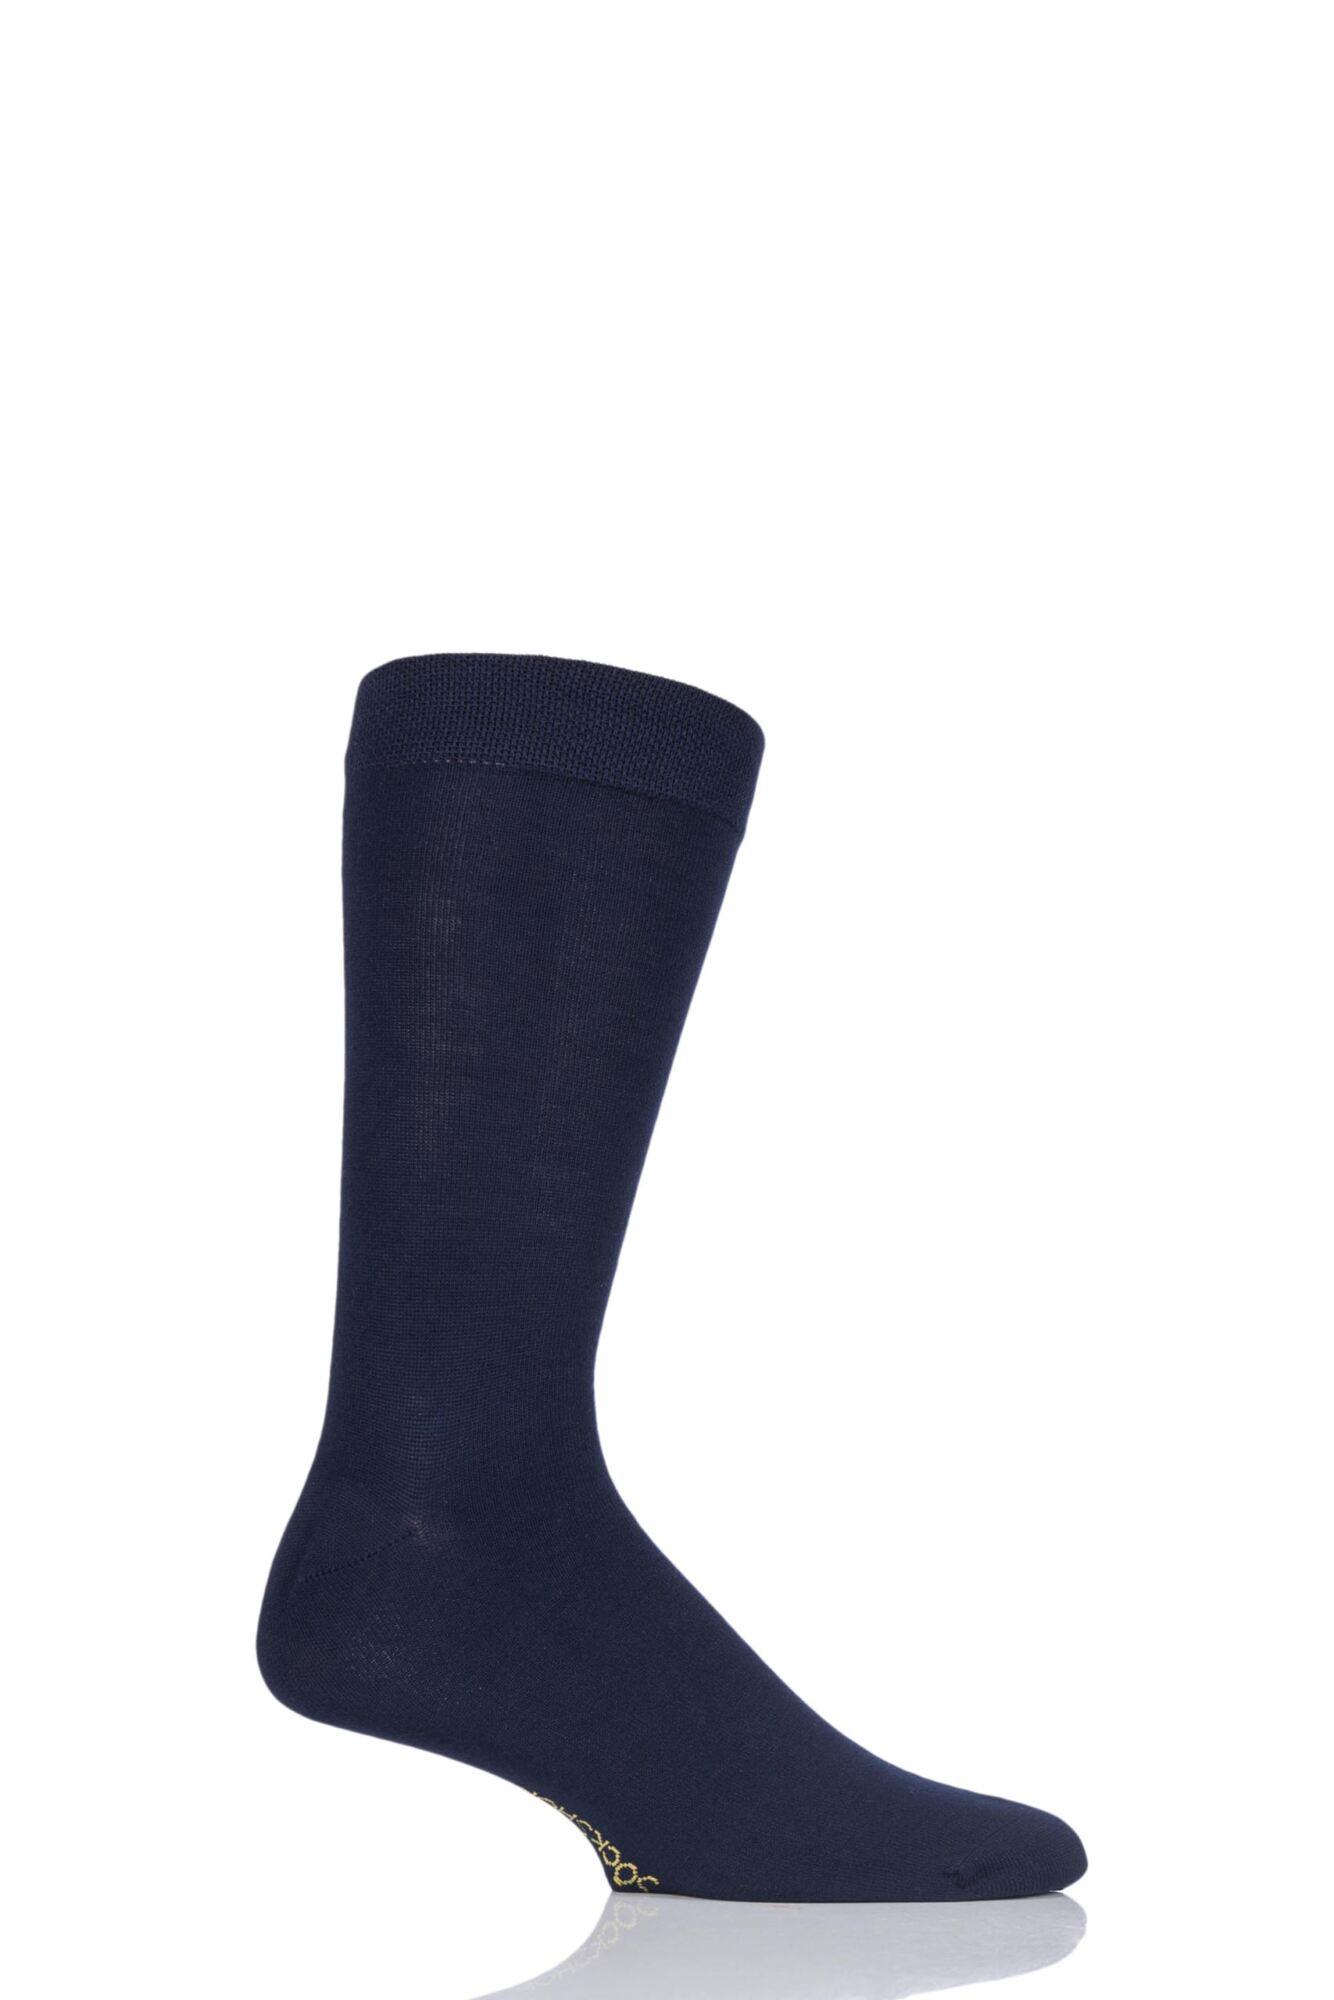 1 Pair Colour Burst Bamboo Socks with Smooth Toe Seams Men's - SOCKSHOP